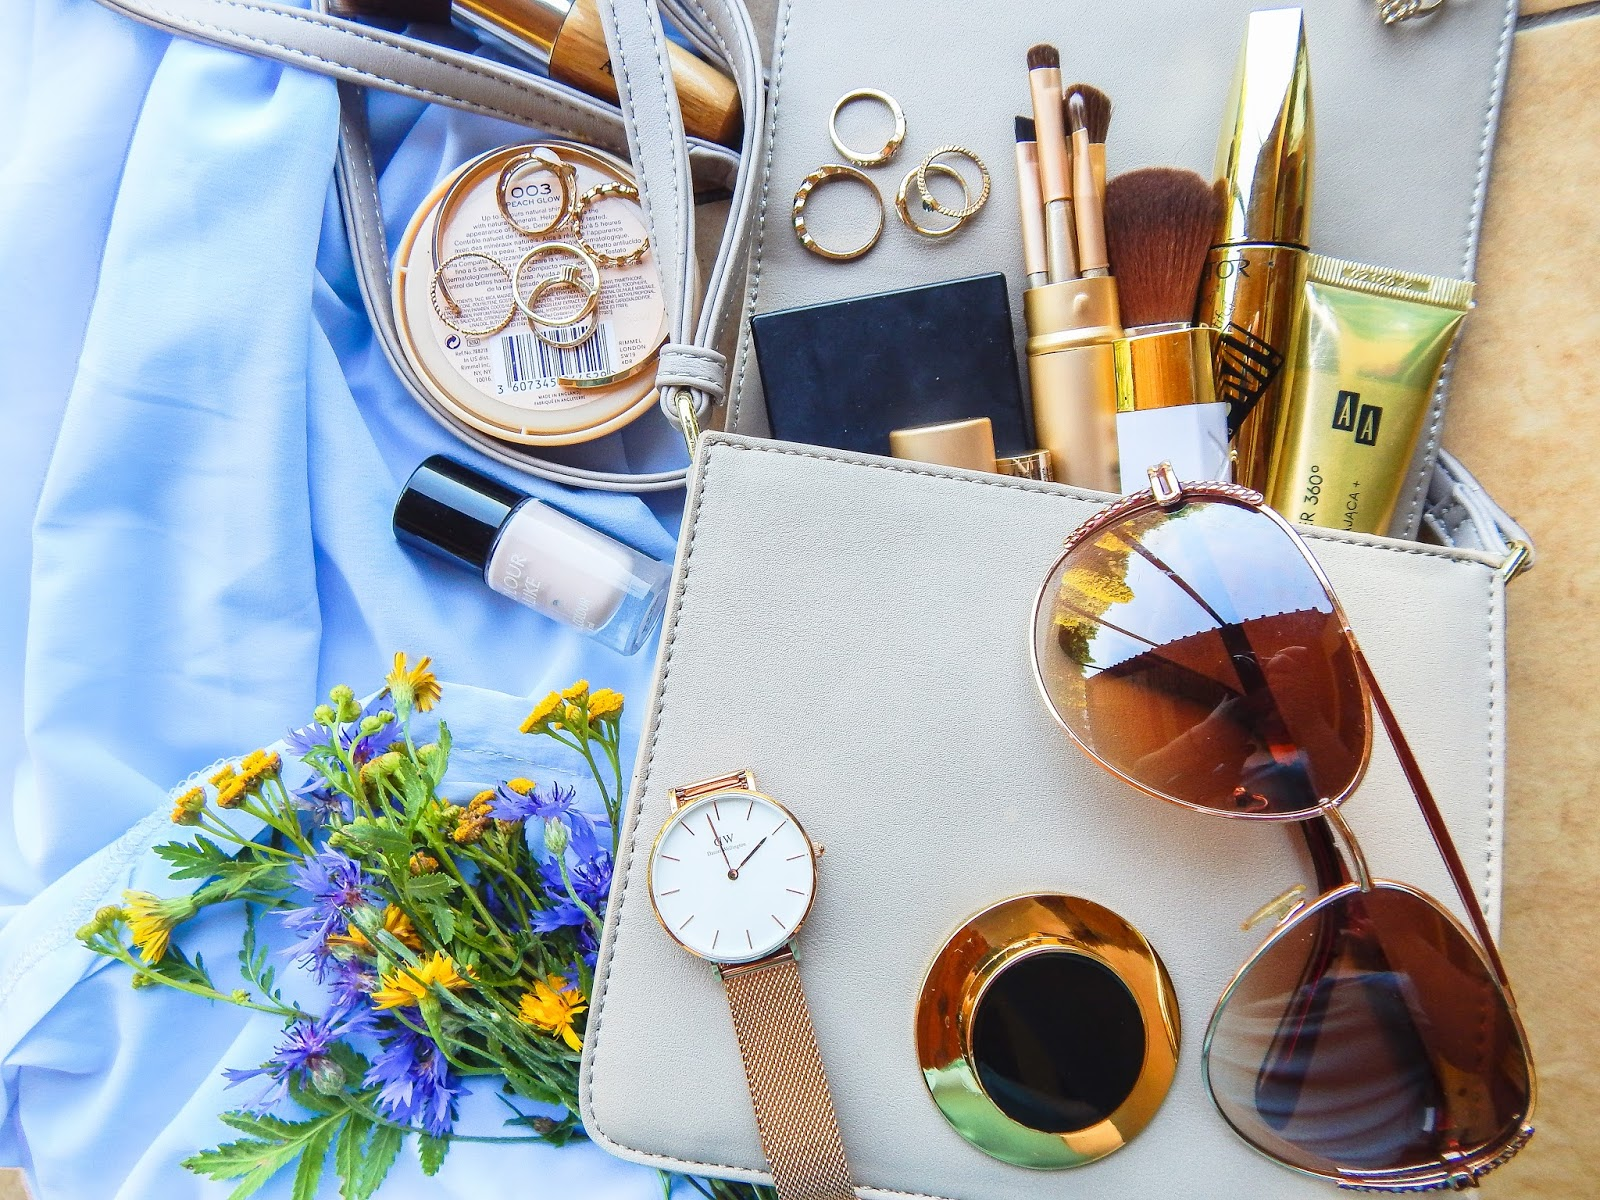 blog konkurs nobo bags wygraj torebkę leganza melodylaniella rozdanie konkursy sierpień 2017 blog konkursy na instagramie giveaway bags poland blogger lifestyle fashion